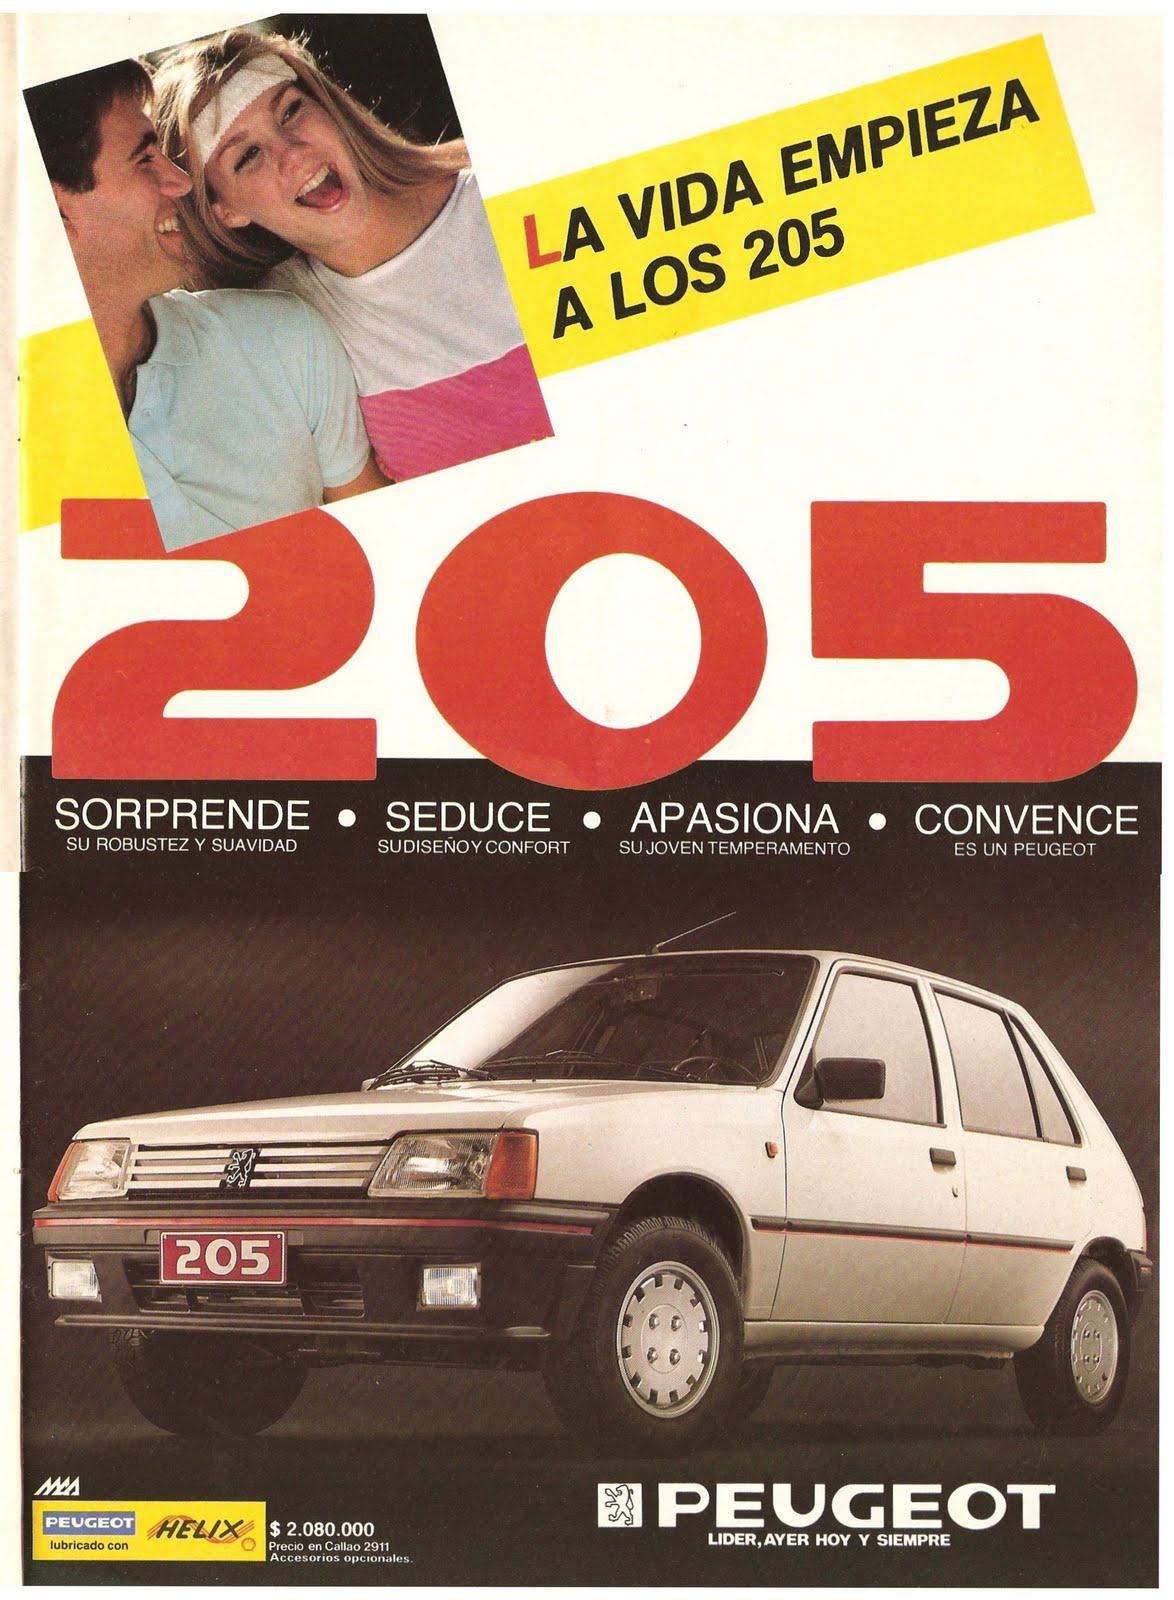 Peugeot_205_1987_Chile_-_Cosas.jpg